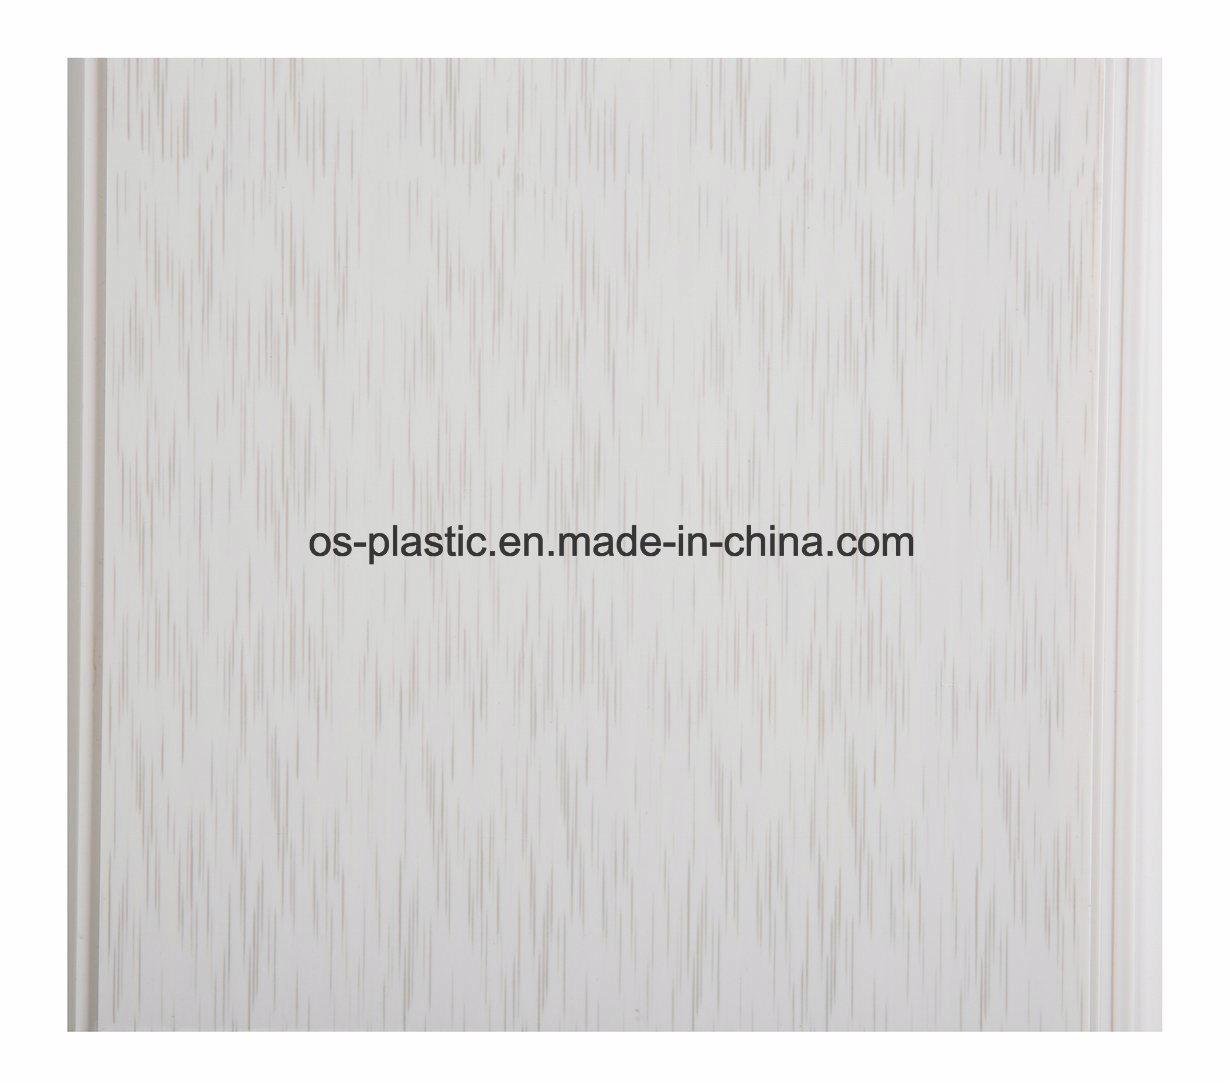 China PVC Cielo Raso PARA Paredes